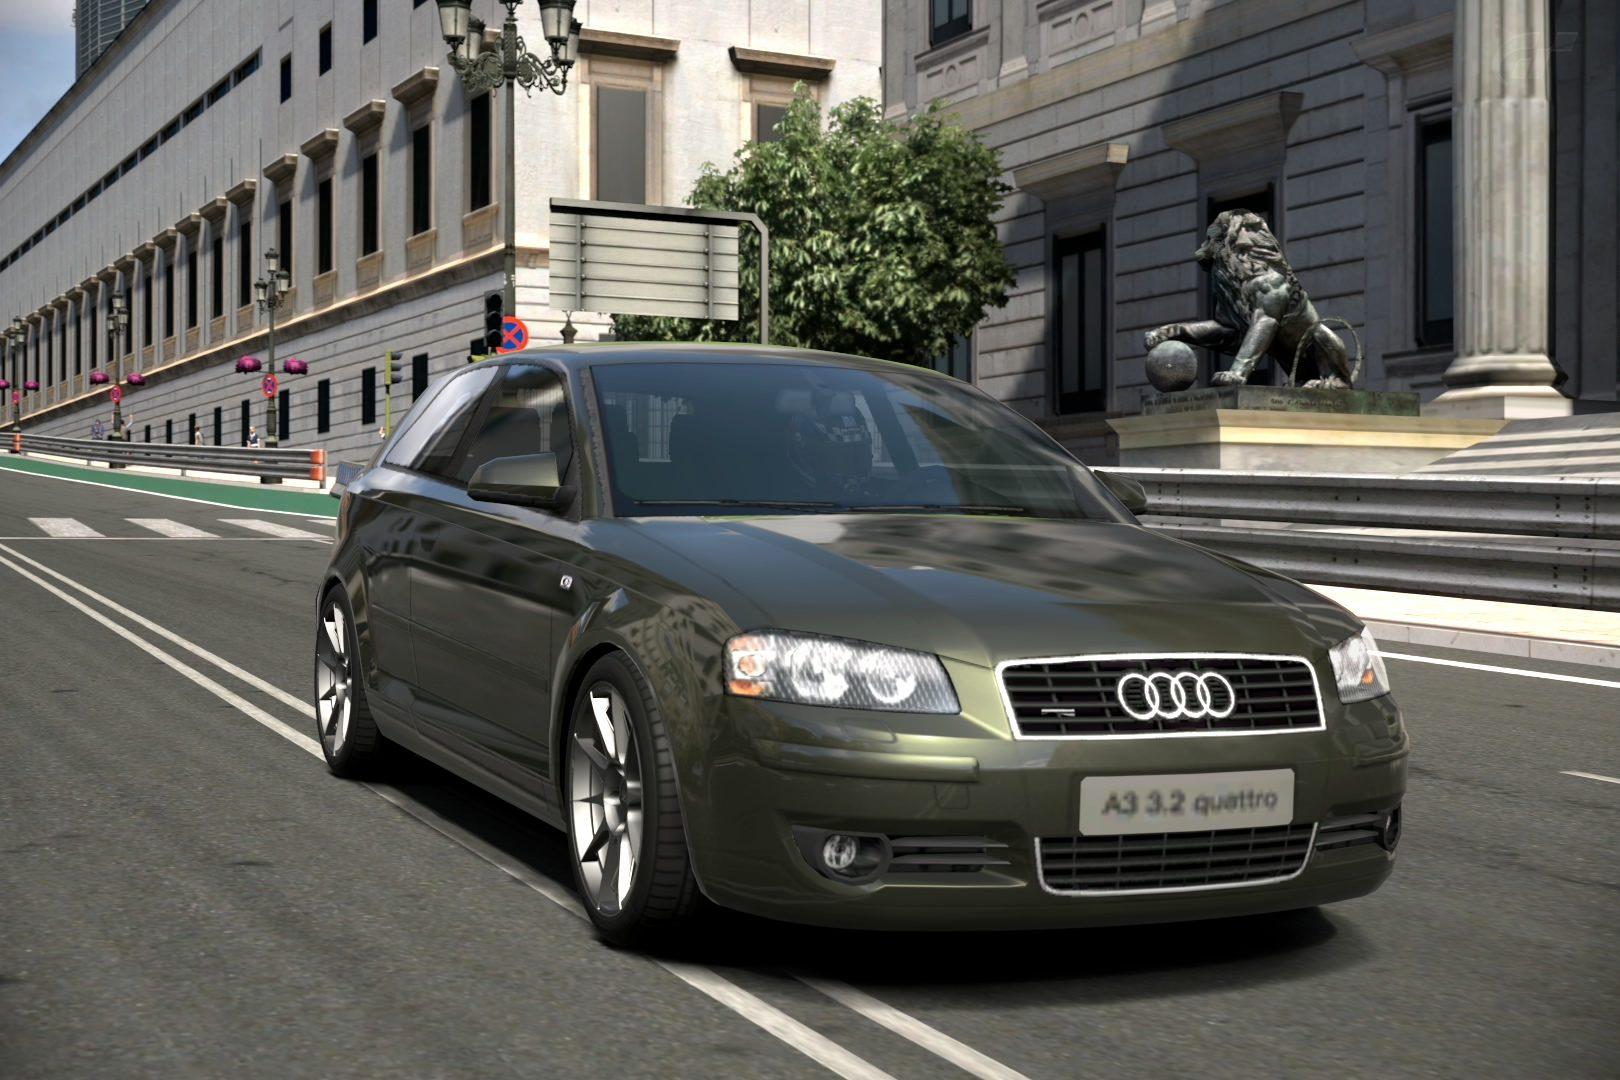 AudiA33203.jpg